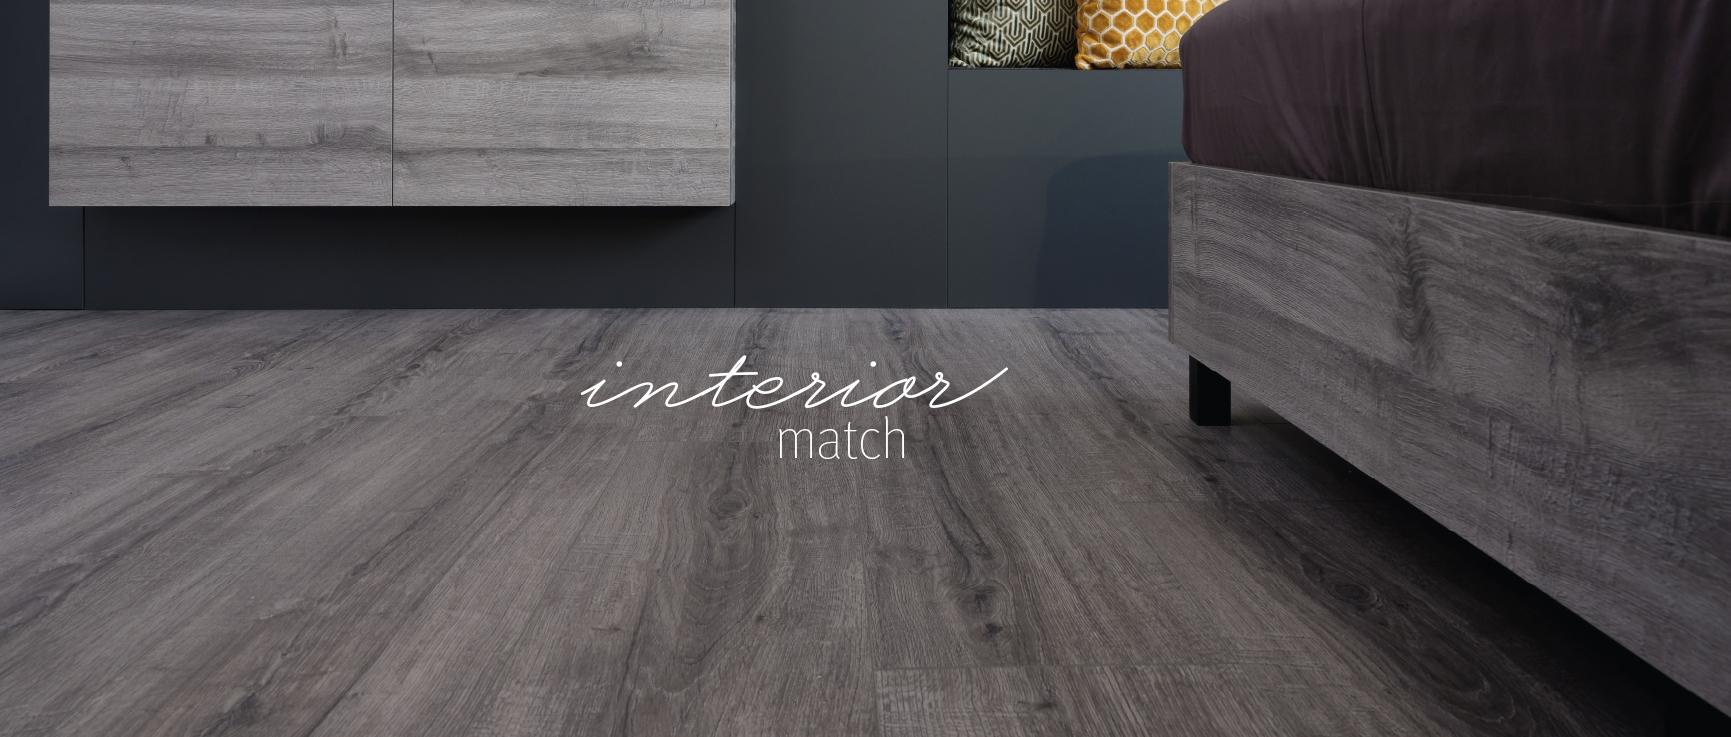 Interior Match: osmišljen za usklađen dizajn nameštaja i podnih obloga